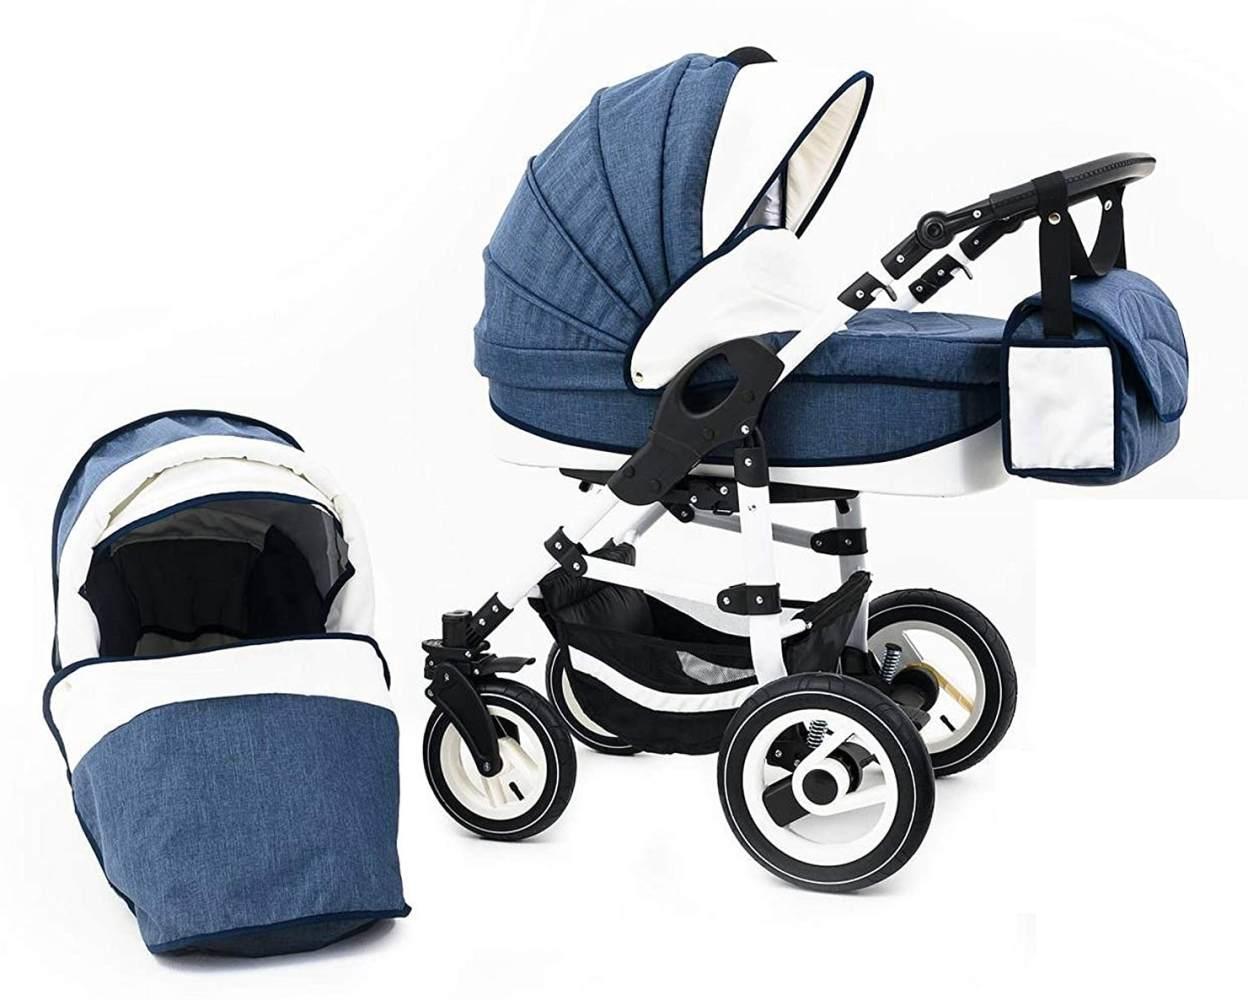 Tabbi ECO LN | 2 in 1 Kombi Kinderwagen | Hartgummireifen | Farbe: Blue Bild 1